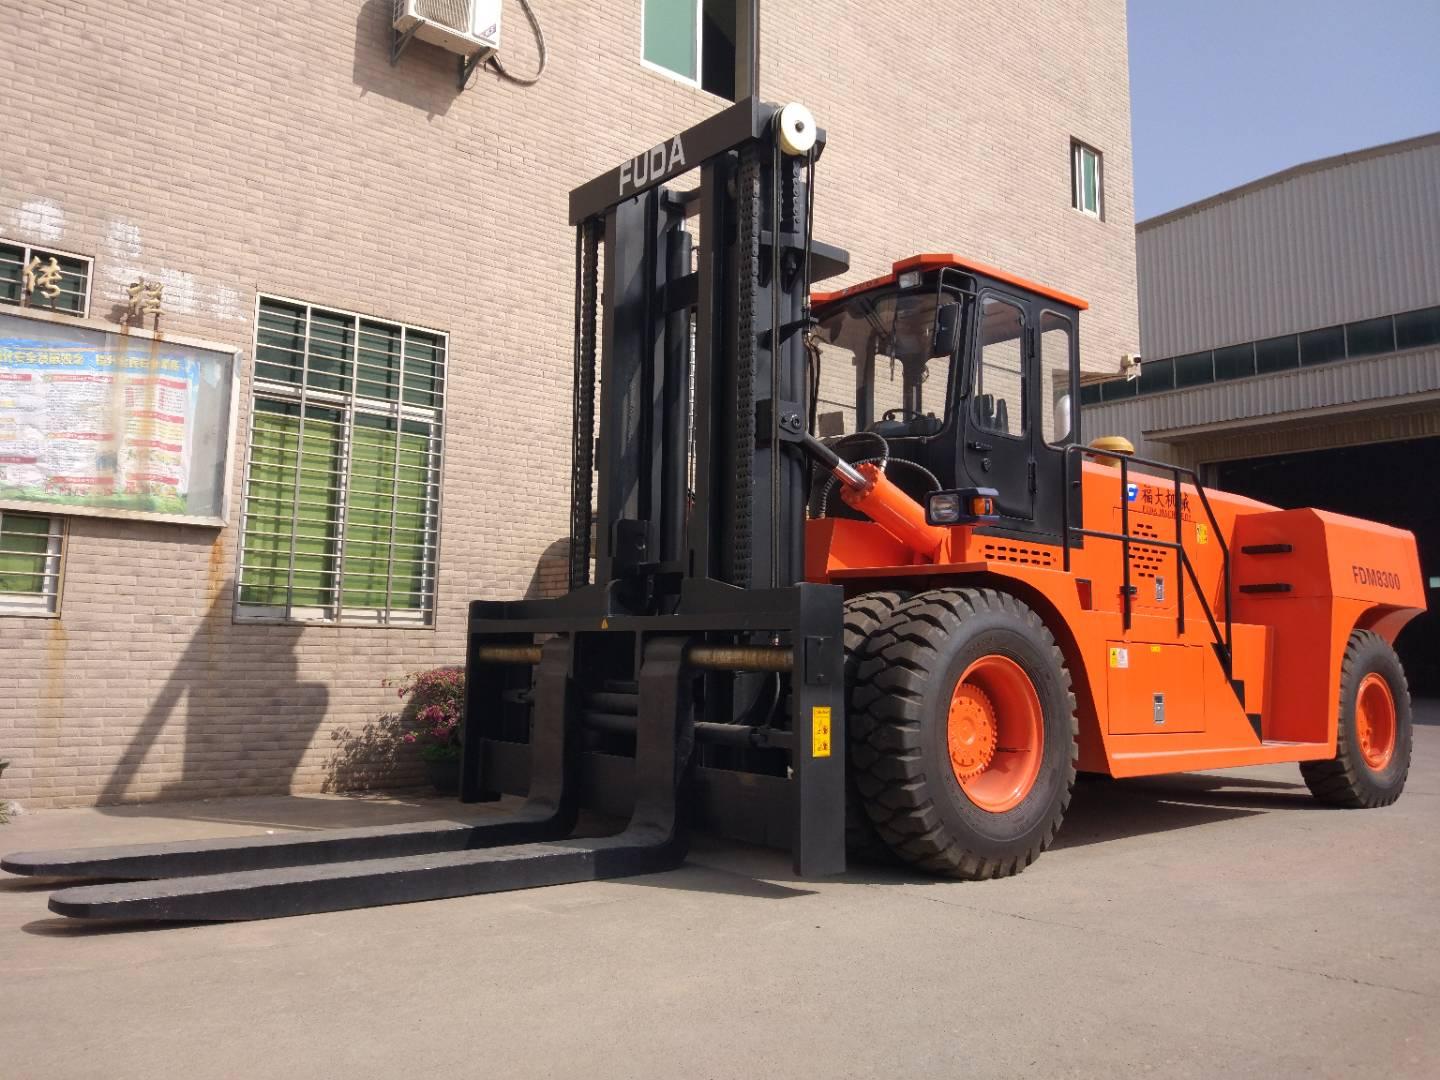 30 ton forklift truck sent to jiangsu, china